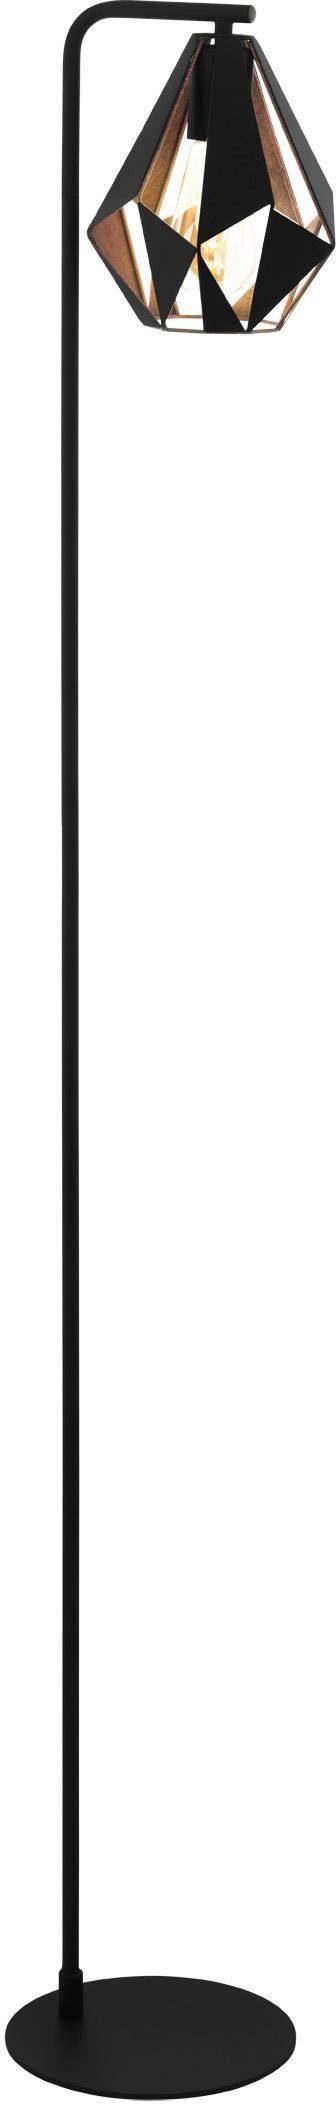 EGLO,Stehlampe»CARLTON 4«   Lampen > Stehlampen   EGLO